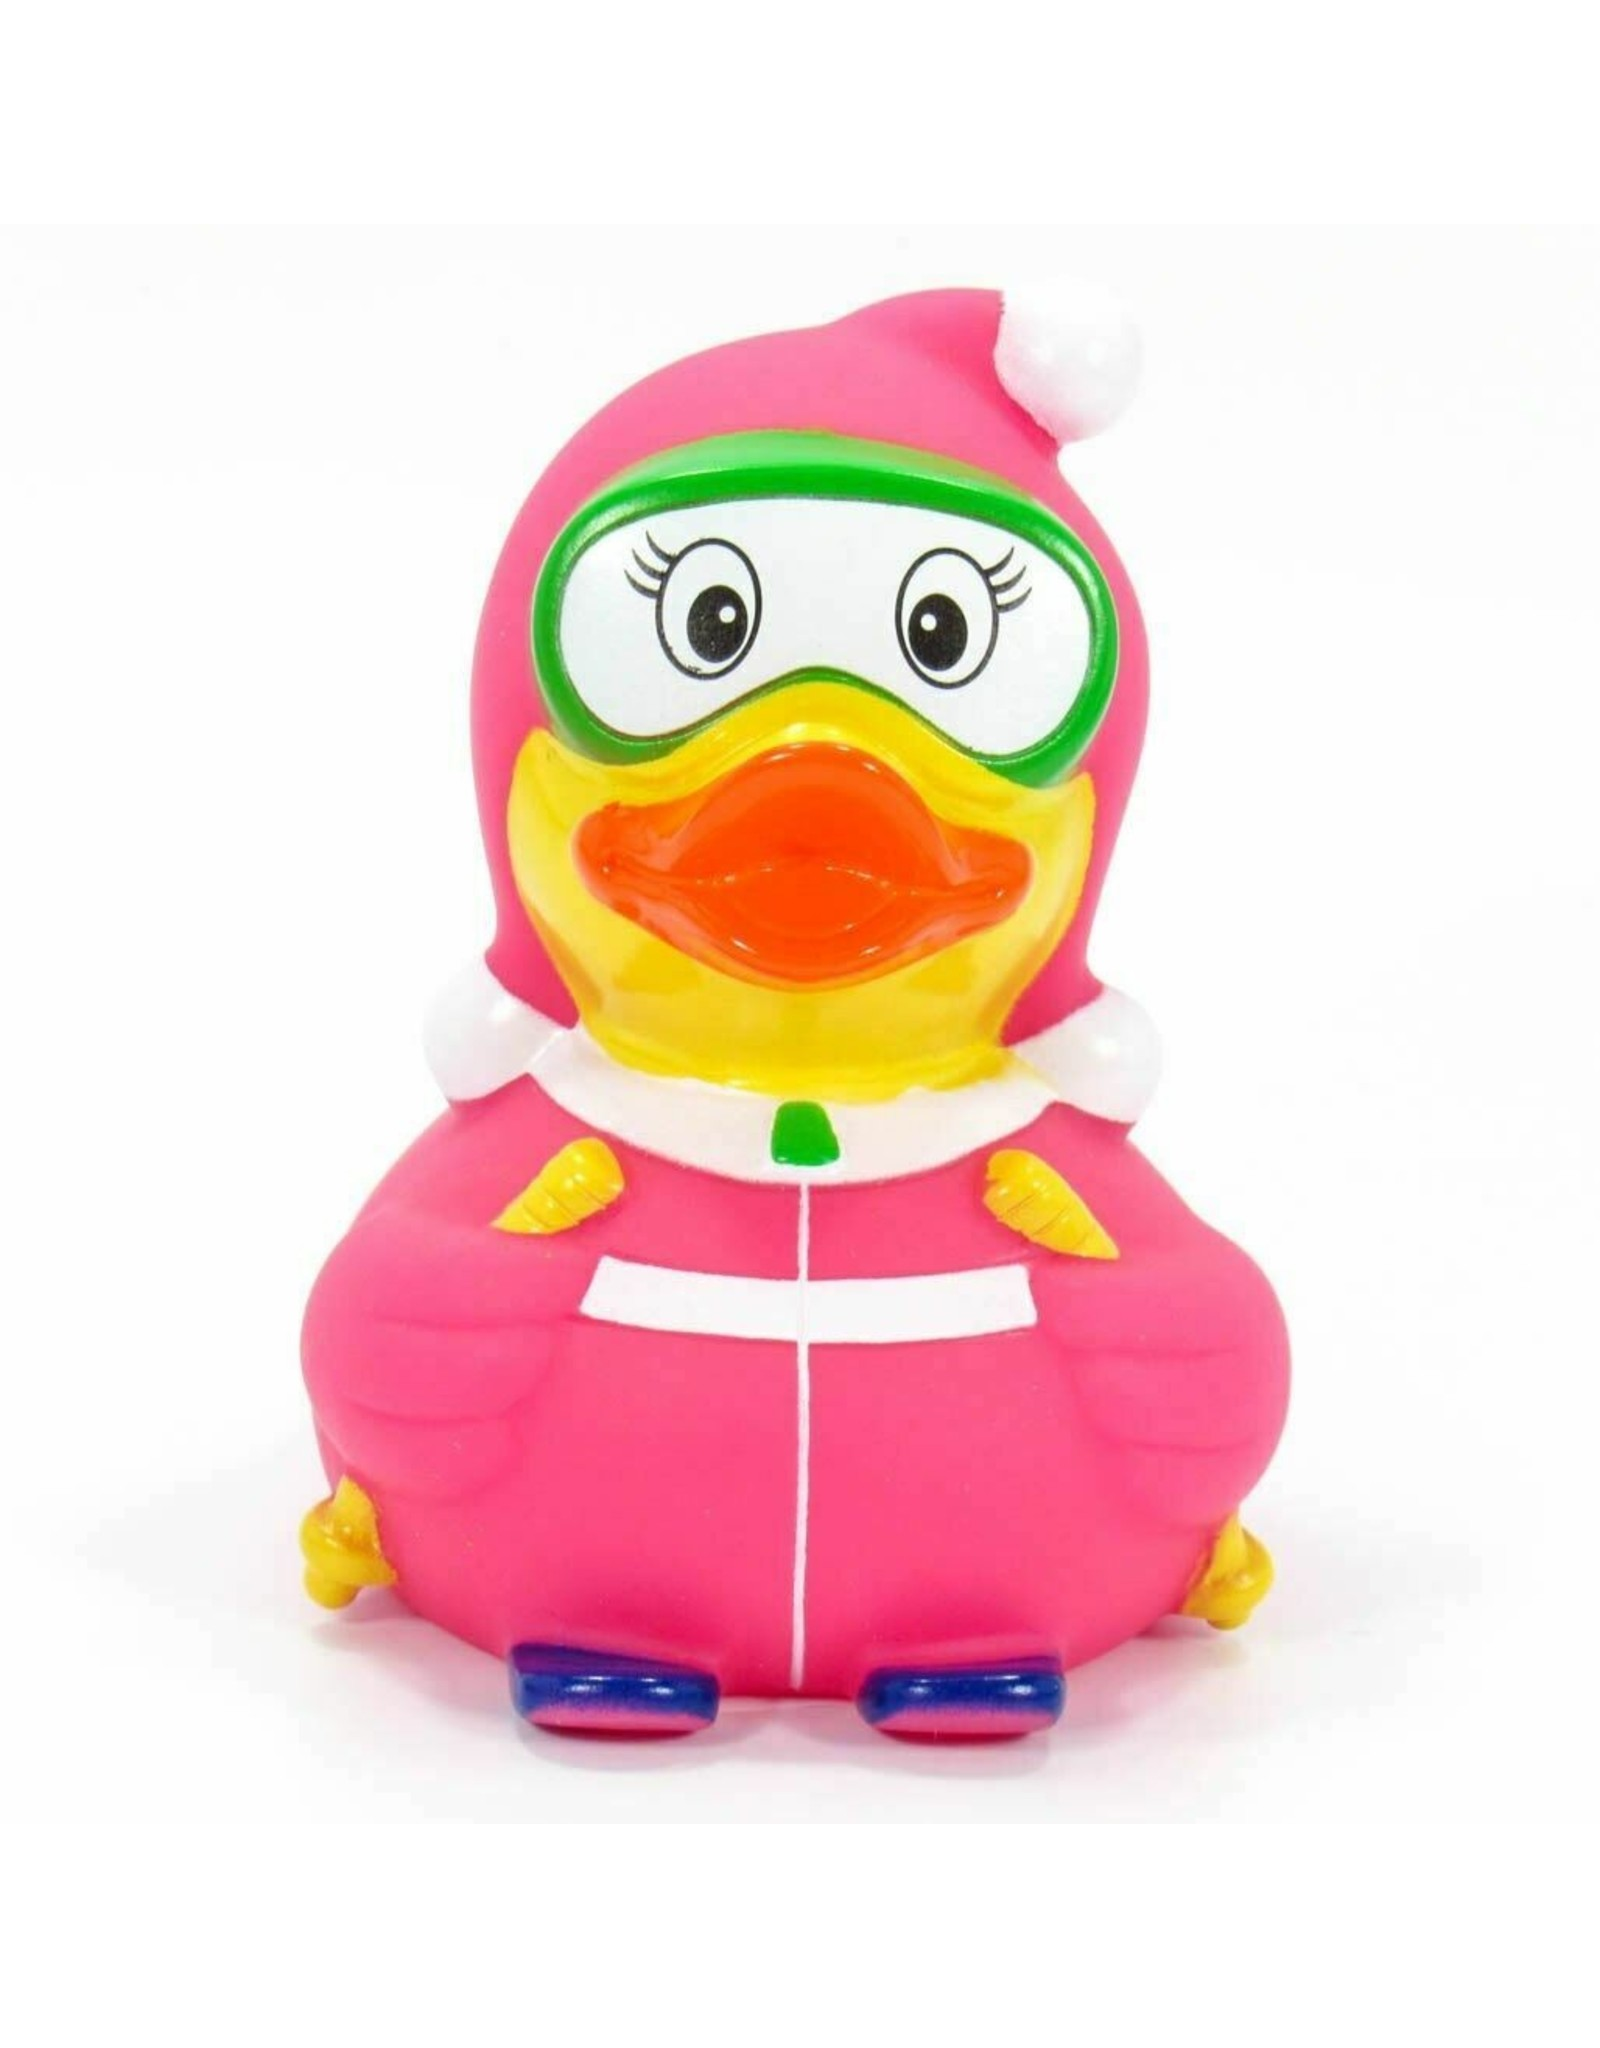 Skier Rubber Duck